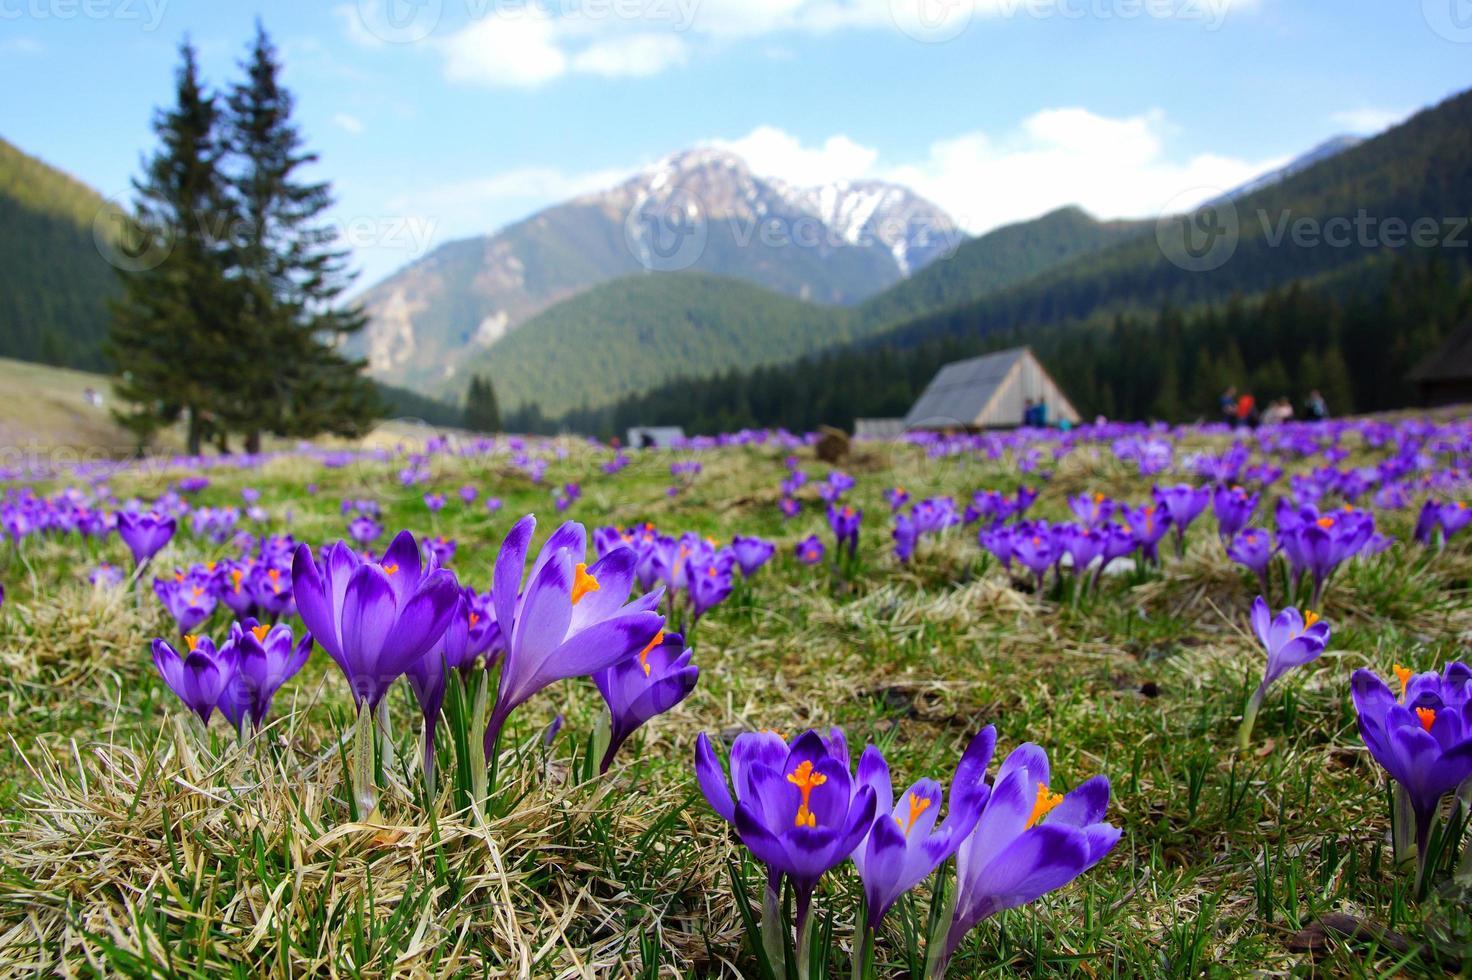 krokusar i chocholowska dalen, Tatrabergen, Polen foto